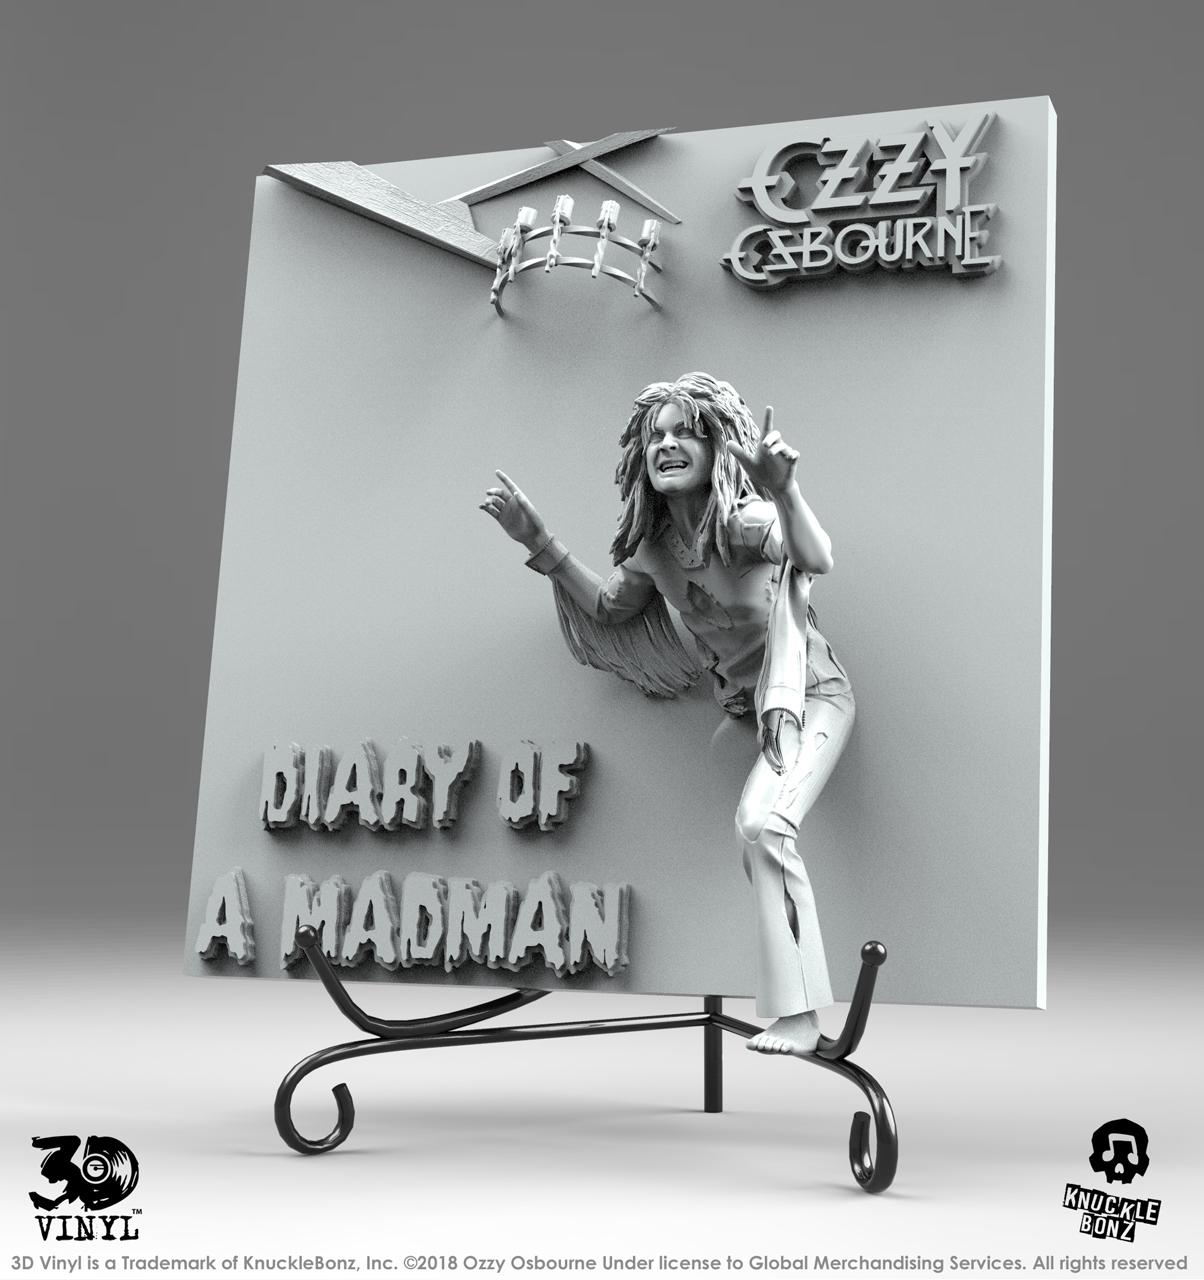 Ozzy Osbourne (Diary Of A Madman) 3D Vinyl